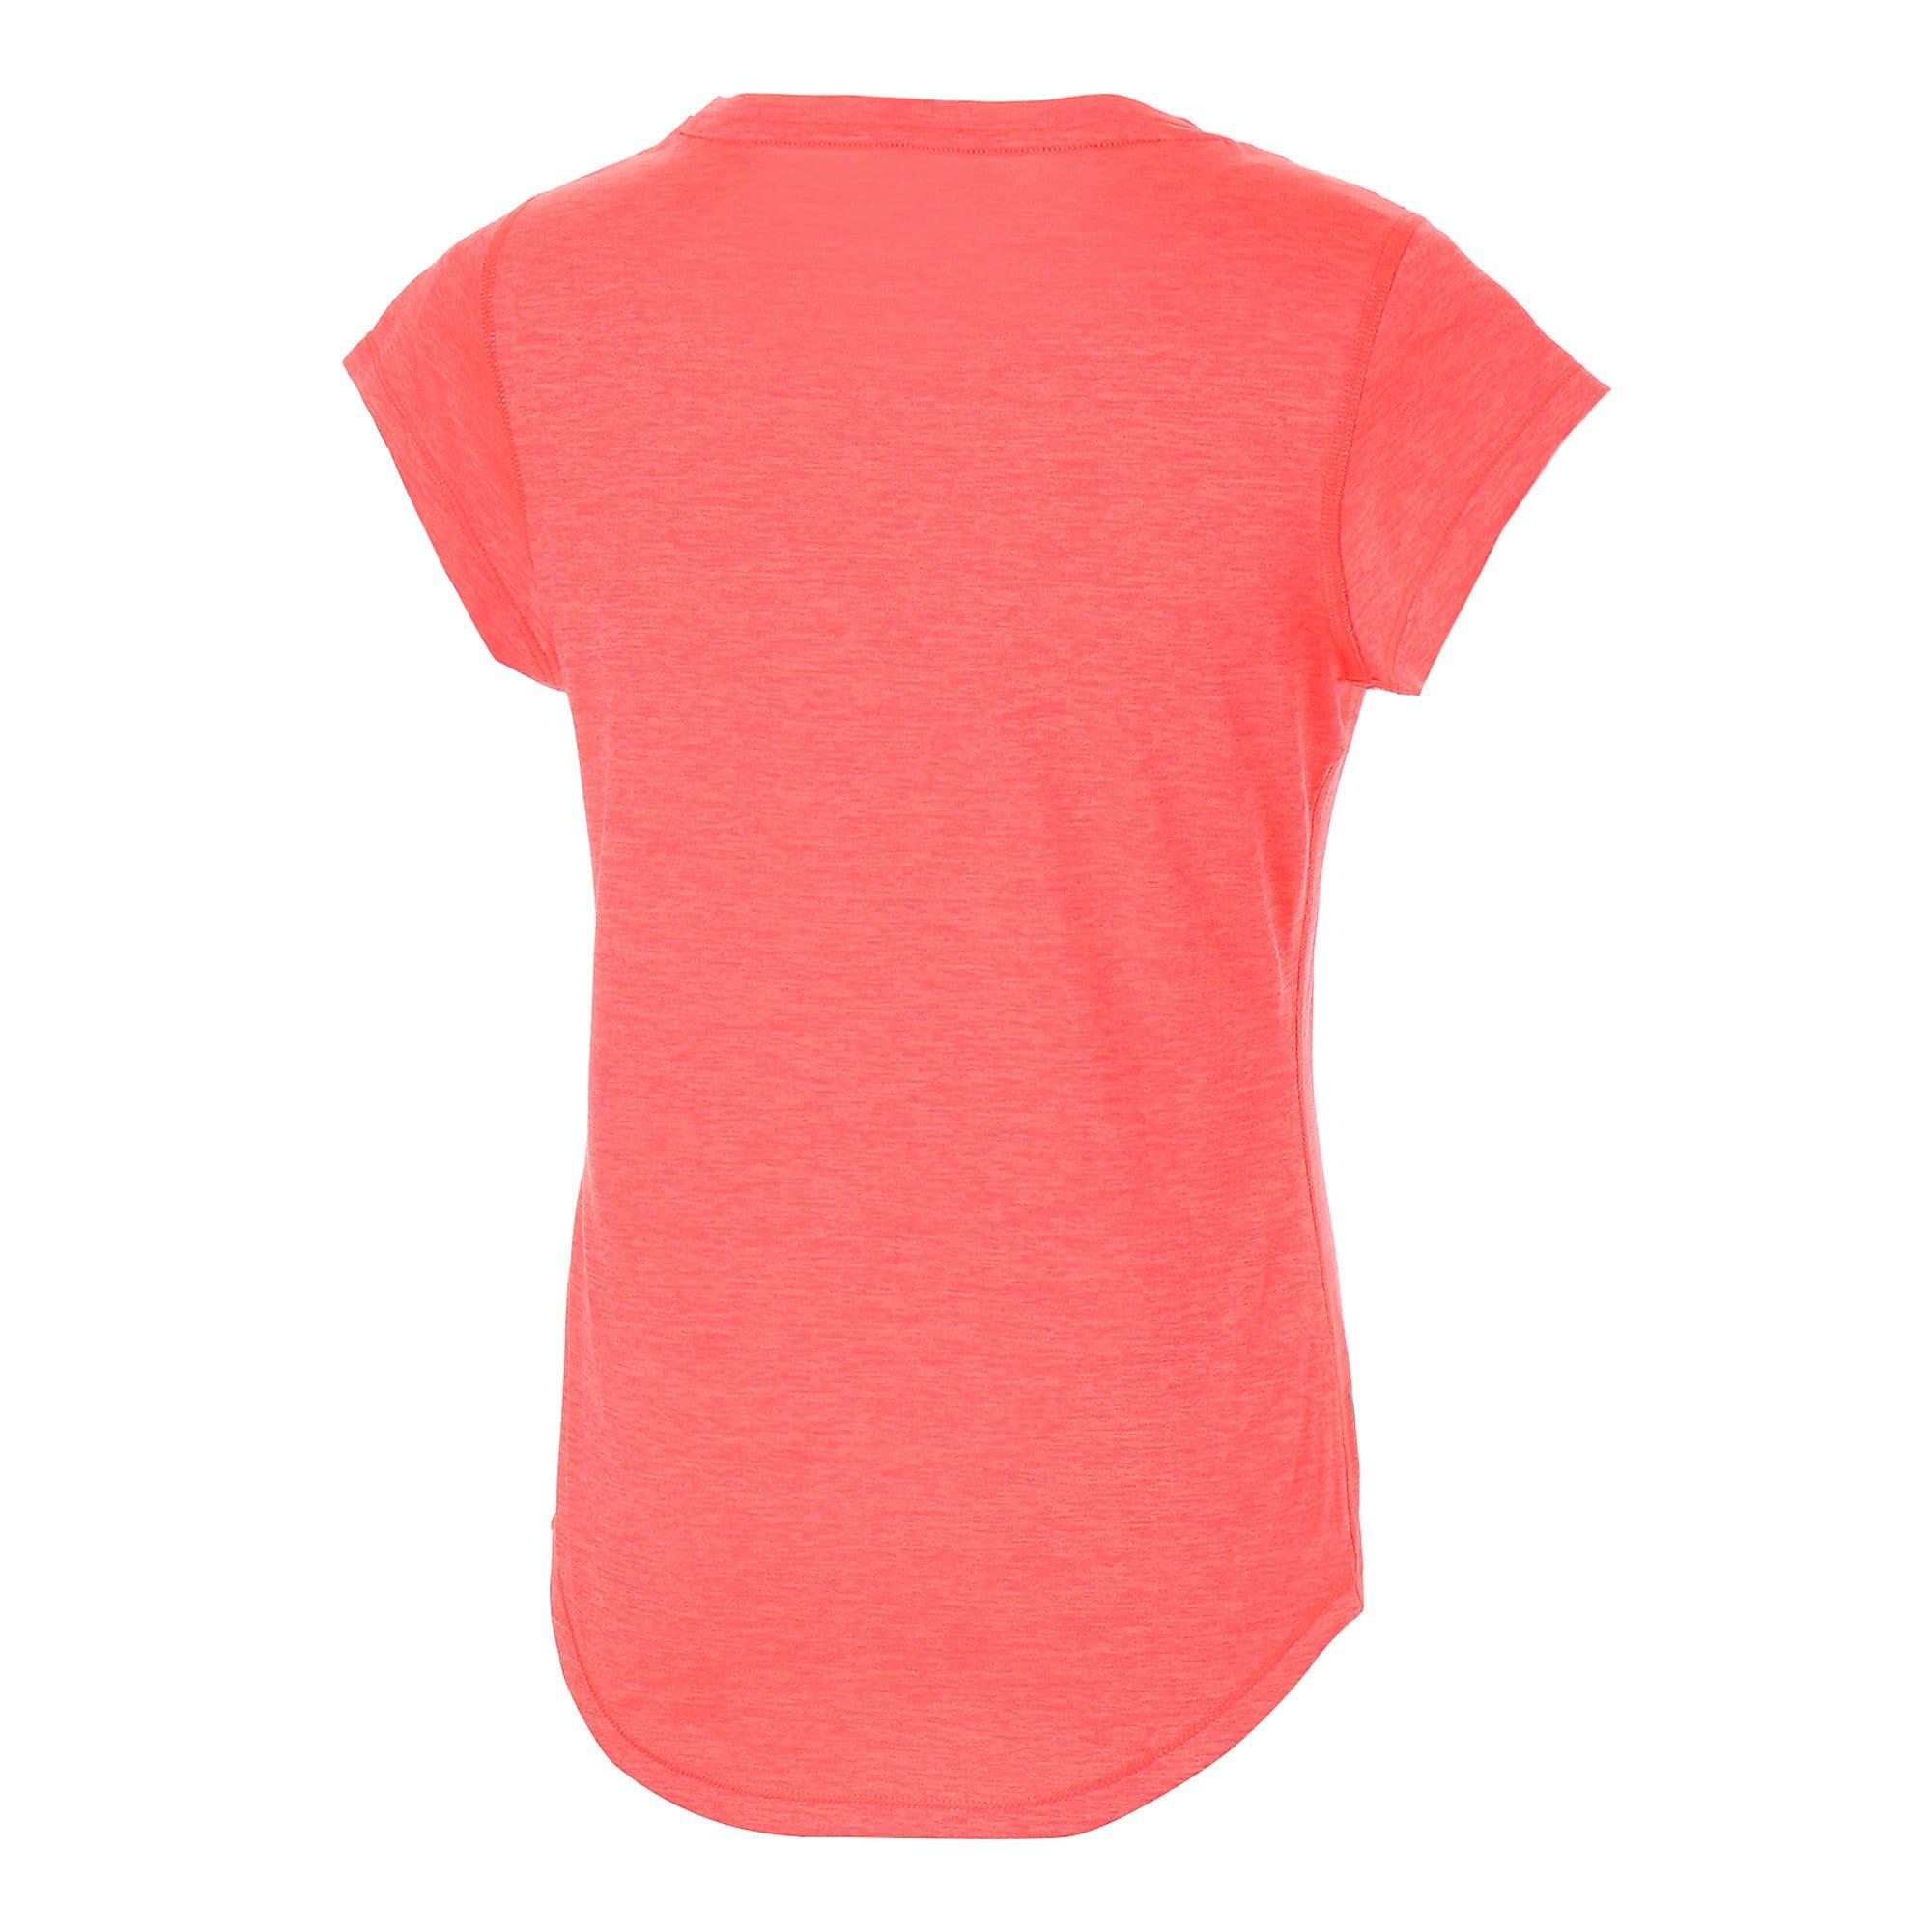 Thumbnail 6 of ヘザー キャット ウィメンズ ランニング Tシャツ 半袖, Pink Alert, medium-JPN